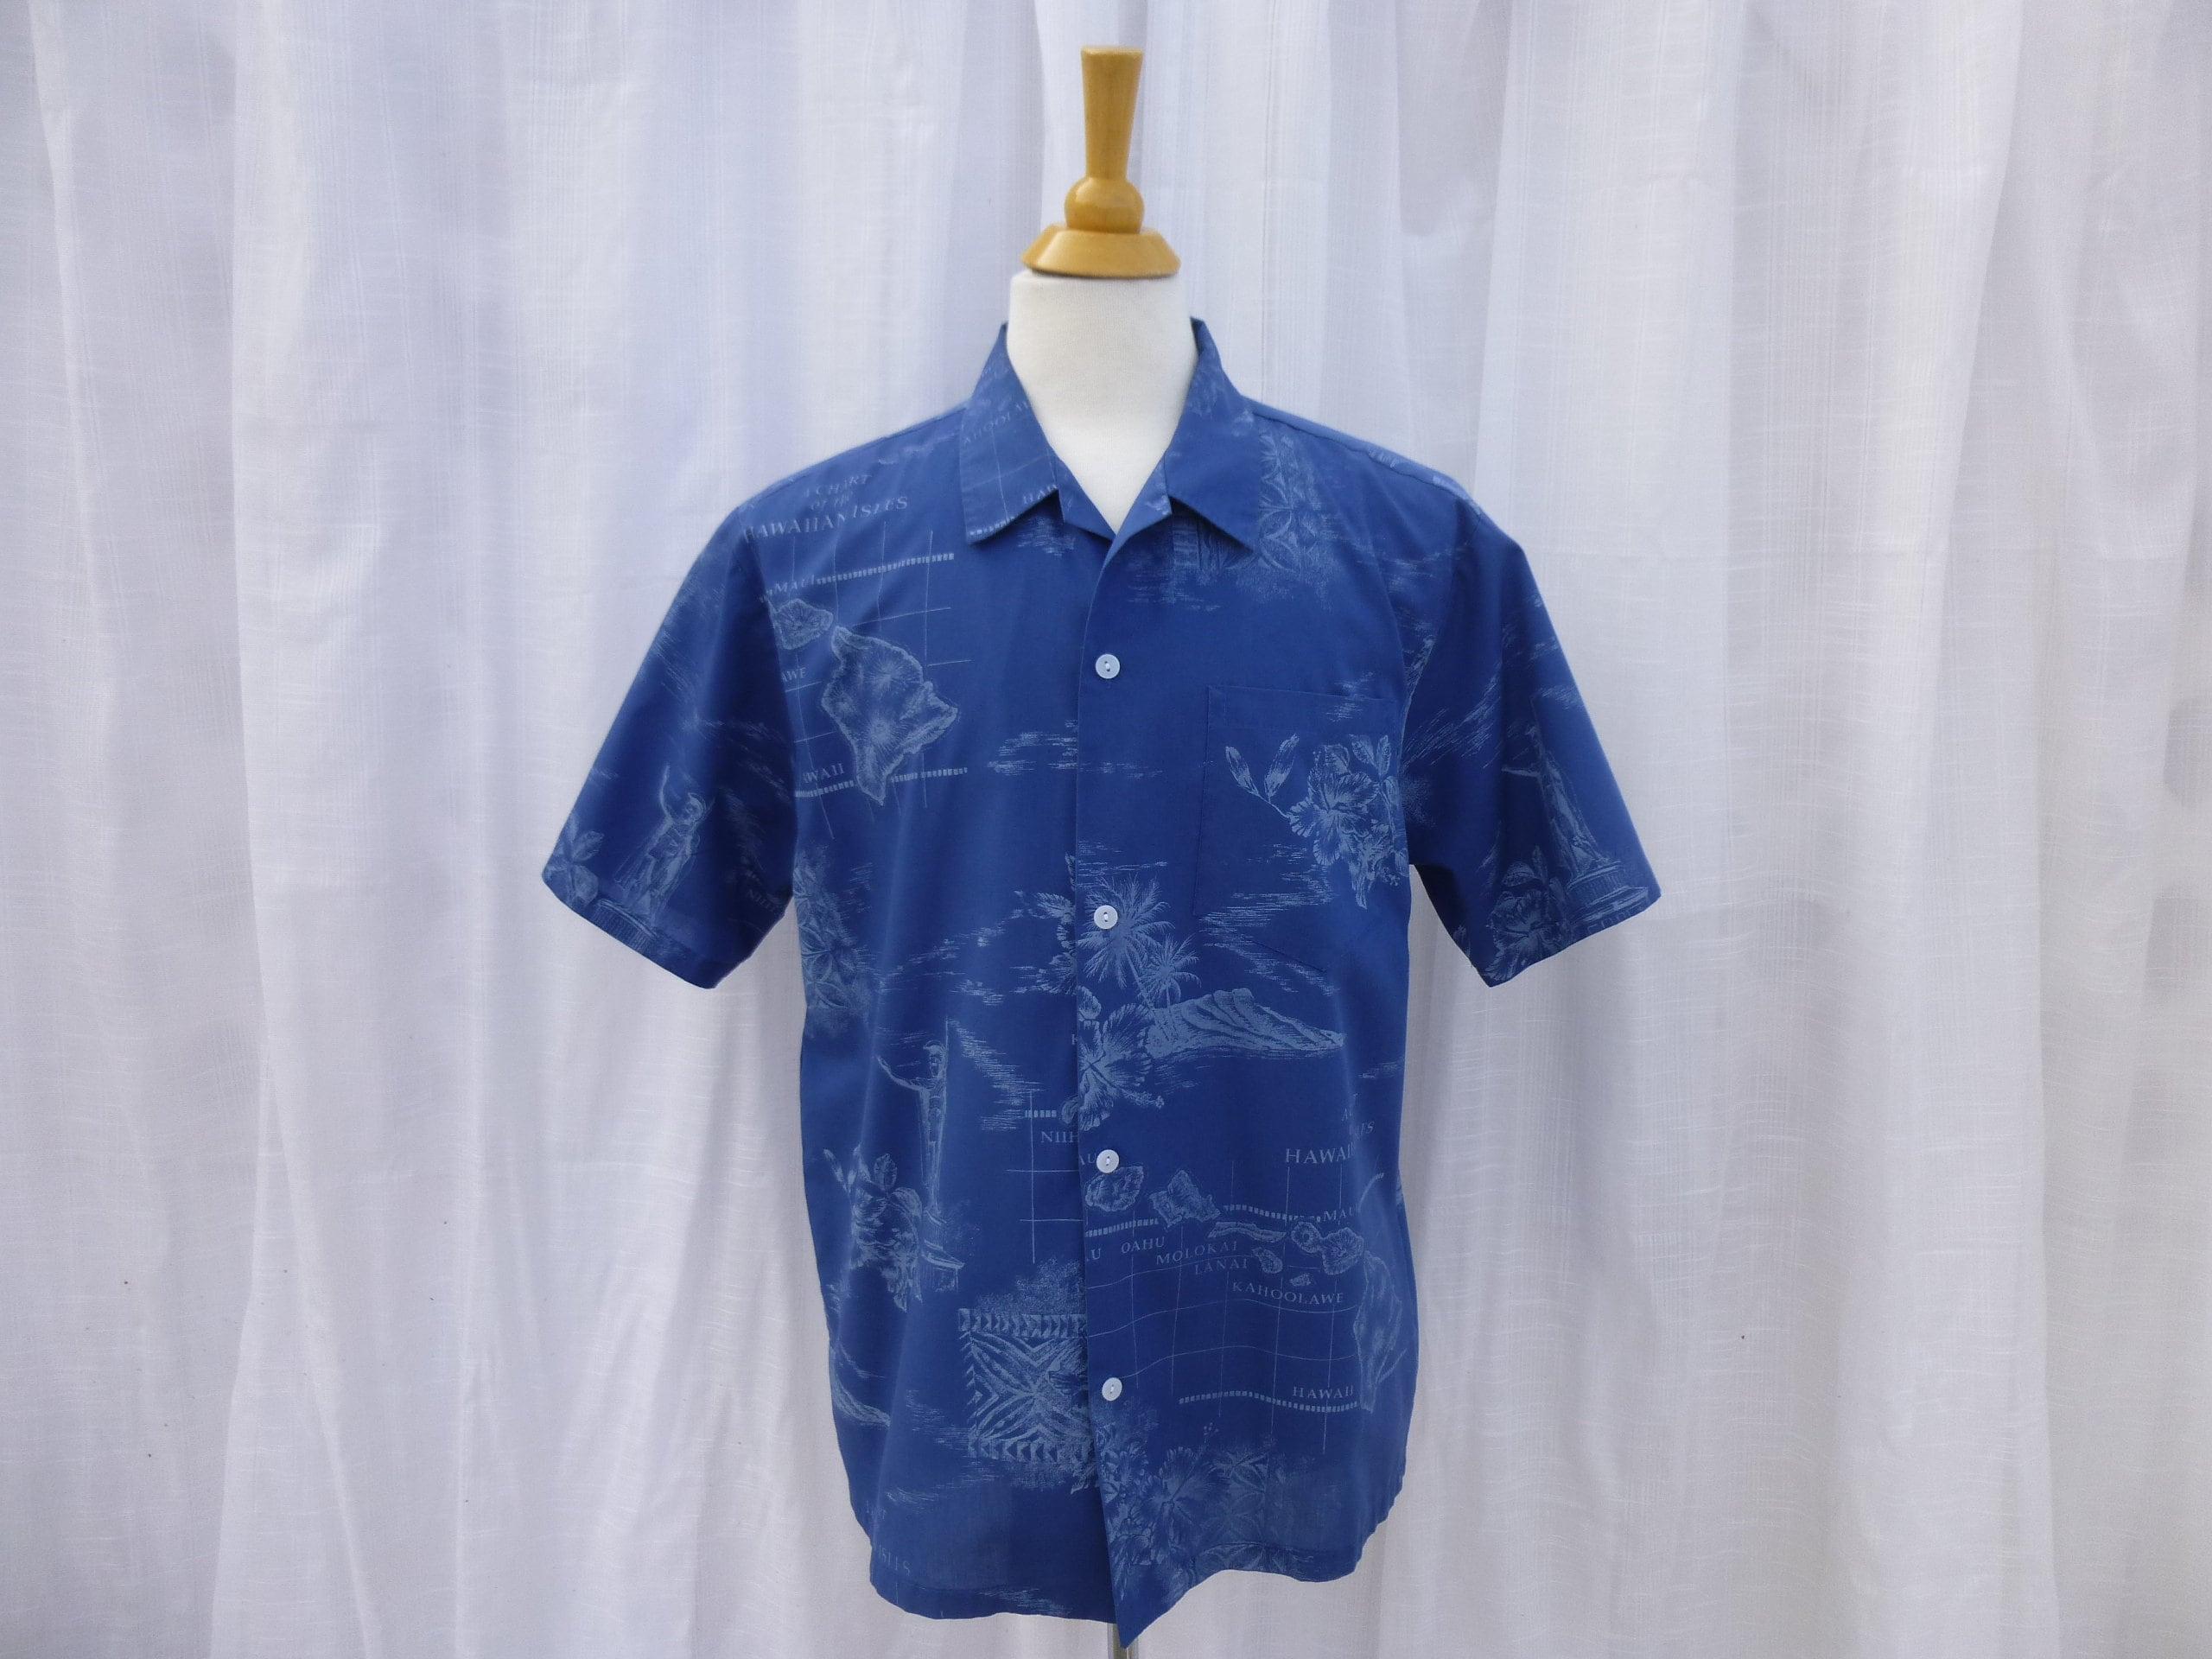 1960s – 70s Men's Ties | Skinny Ties, Slim Ties Vintage 60S Howie Hawaiian Islands Aloha Hawaii Dress Shirt L Xl Blue Short Sleeve Palm-Tree Floral Retro Usa  Read Description Glam Garb $33.00 AT vintagedancer.com